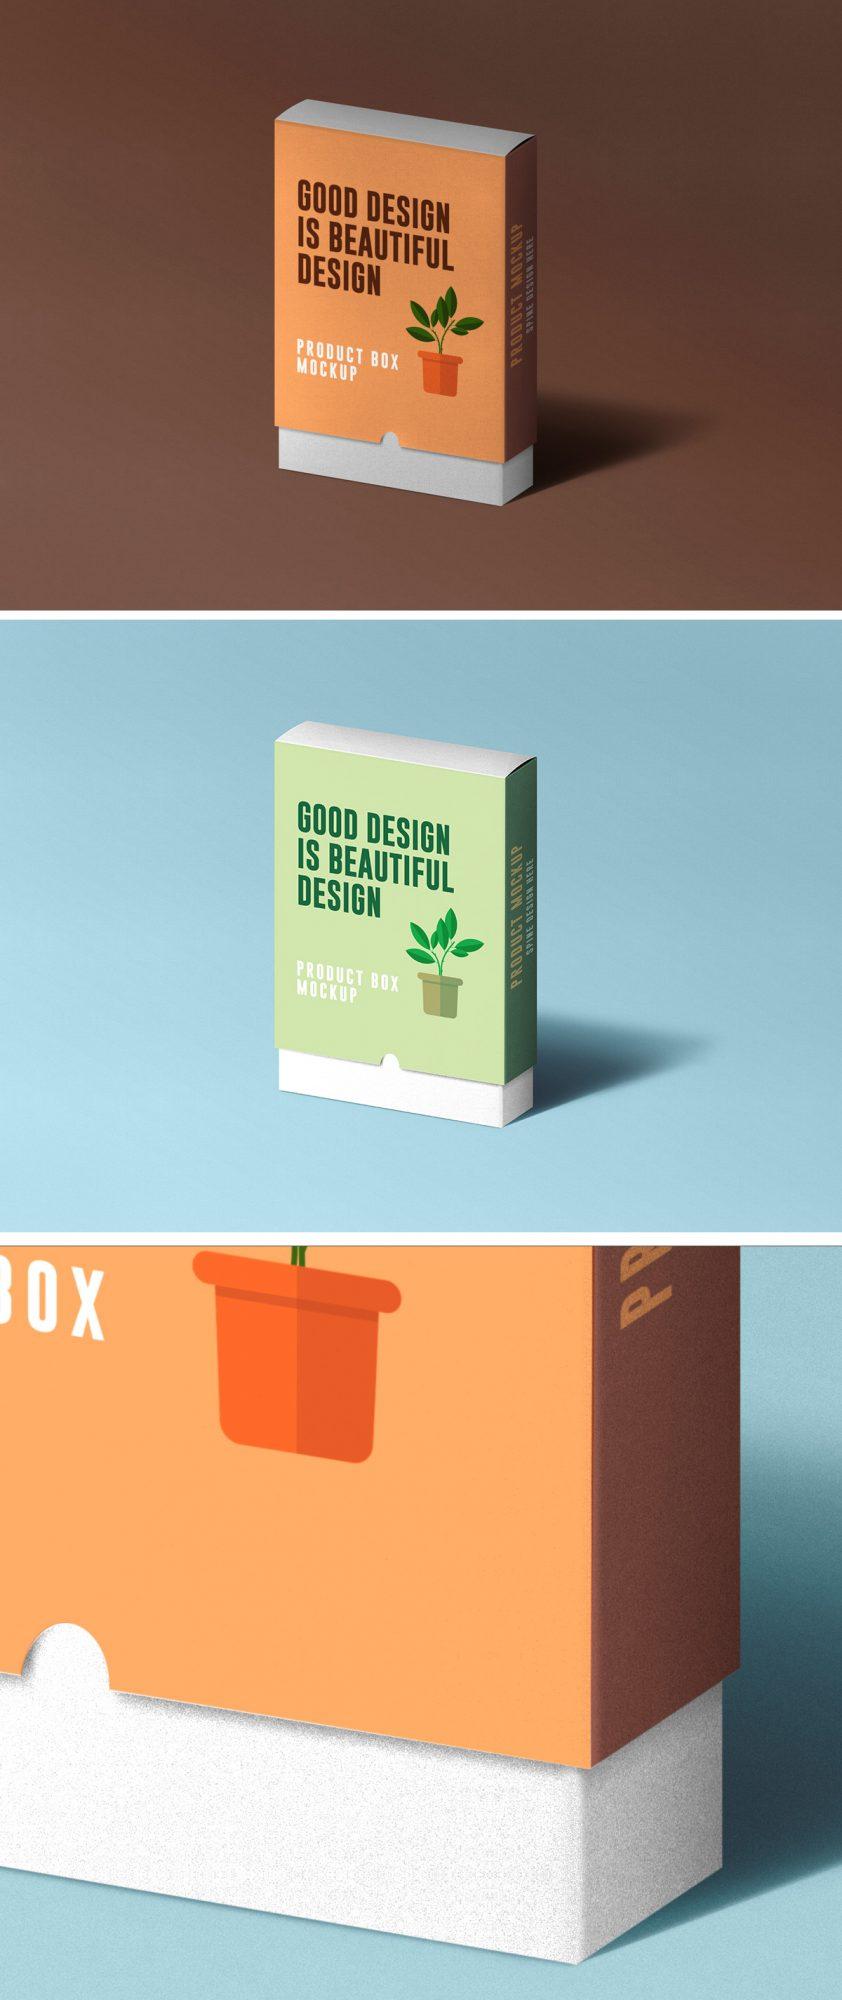 Slide Product Box Mockup - Free Mockup Download